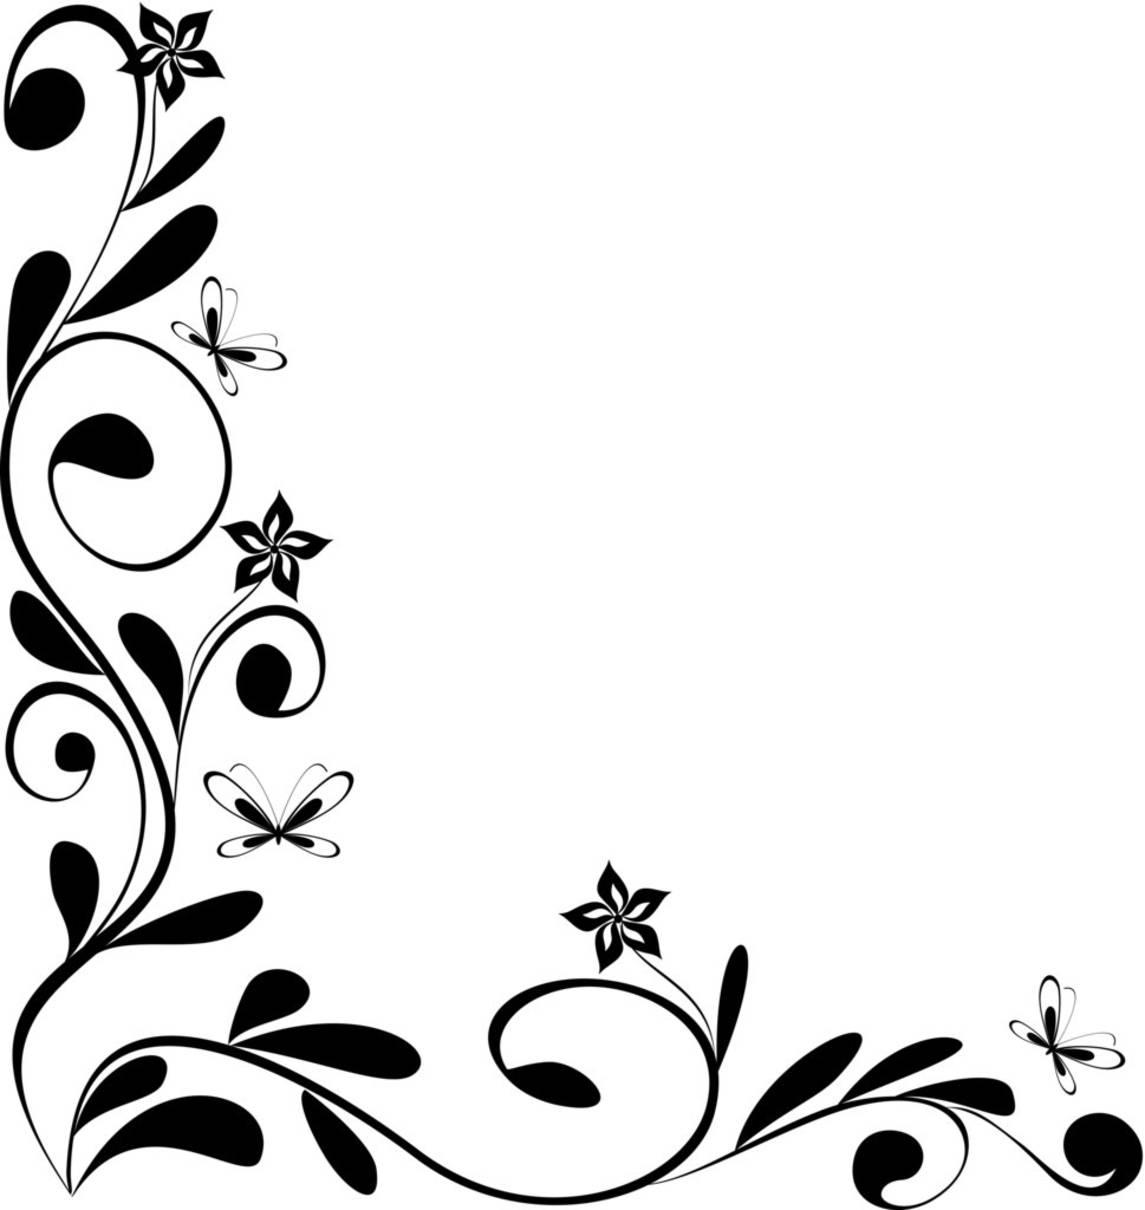 Free Love Cliparts Border Download Free Clip Art Free